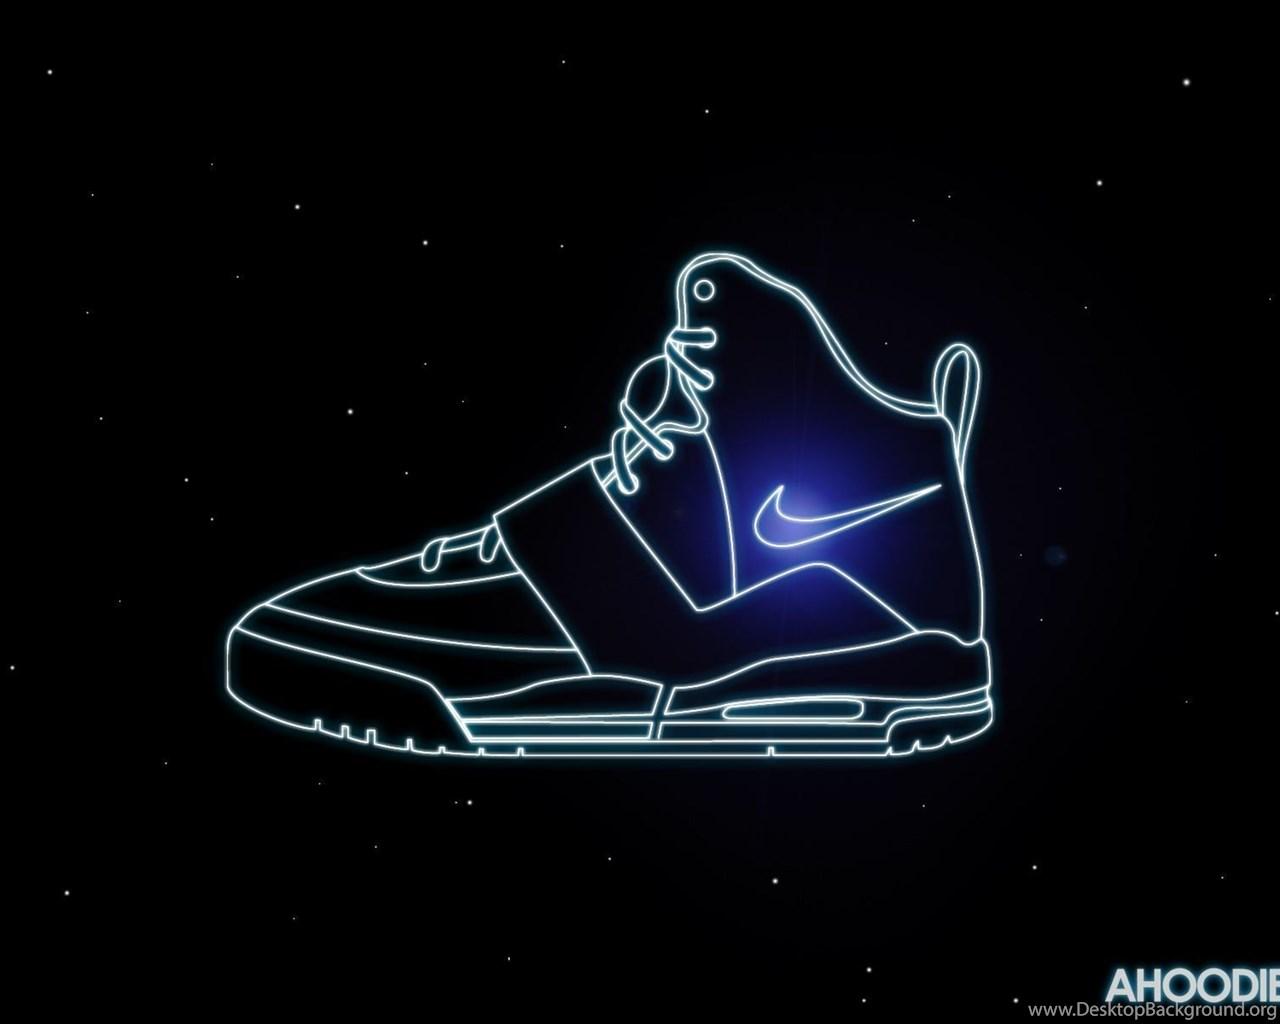 Nike Shoes Wallpapers 10 Jpg Desktop Background